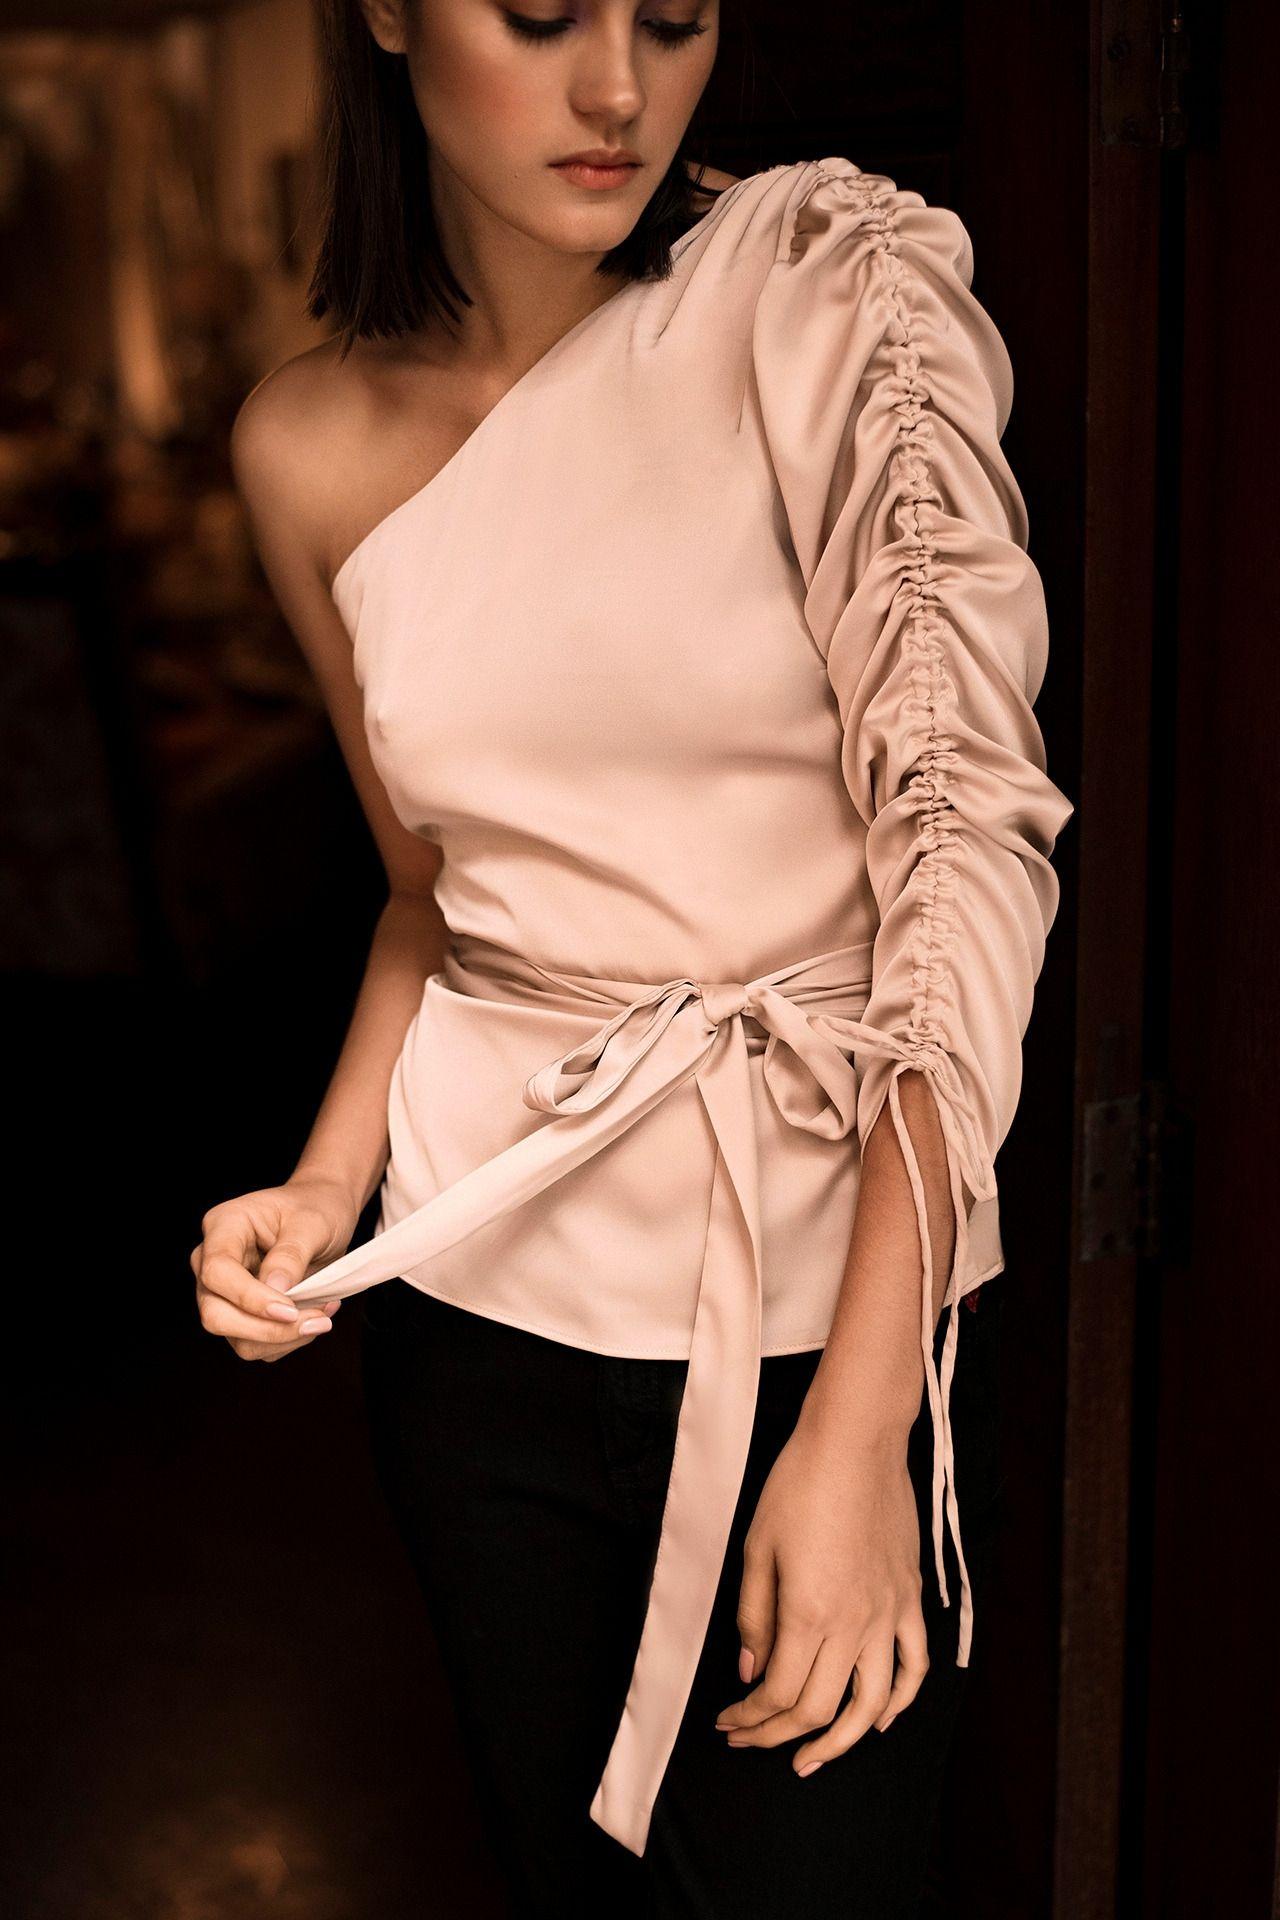 Blusa asimétrica one shoulder con manga corrugada y lazo a la cintura.  Talla Standard.